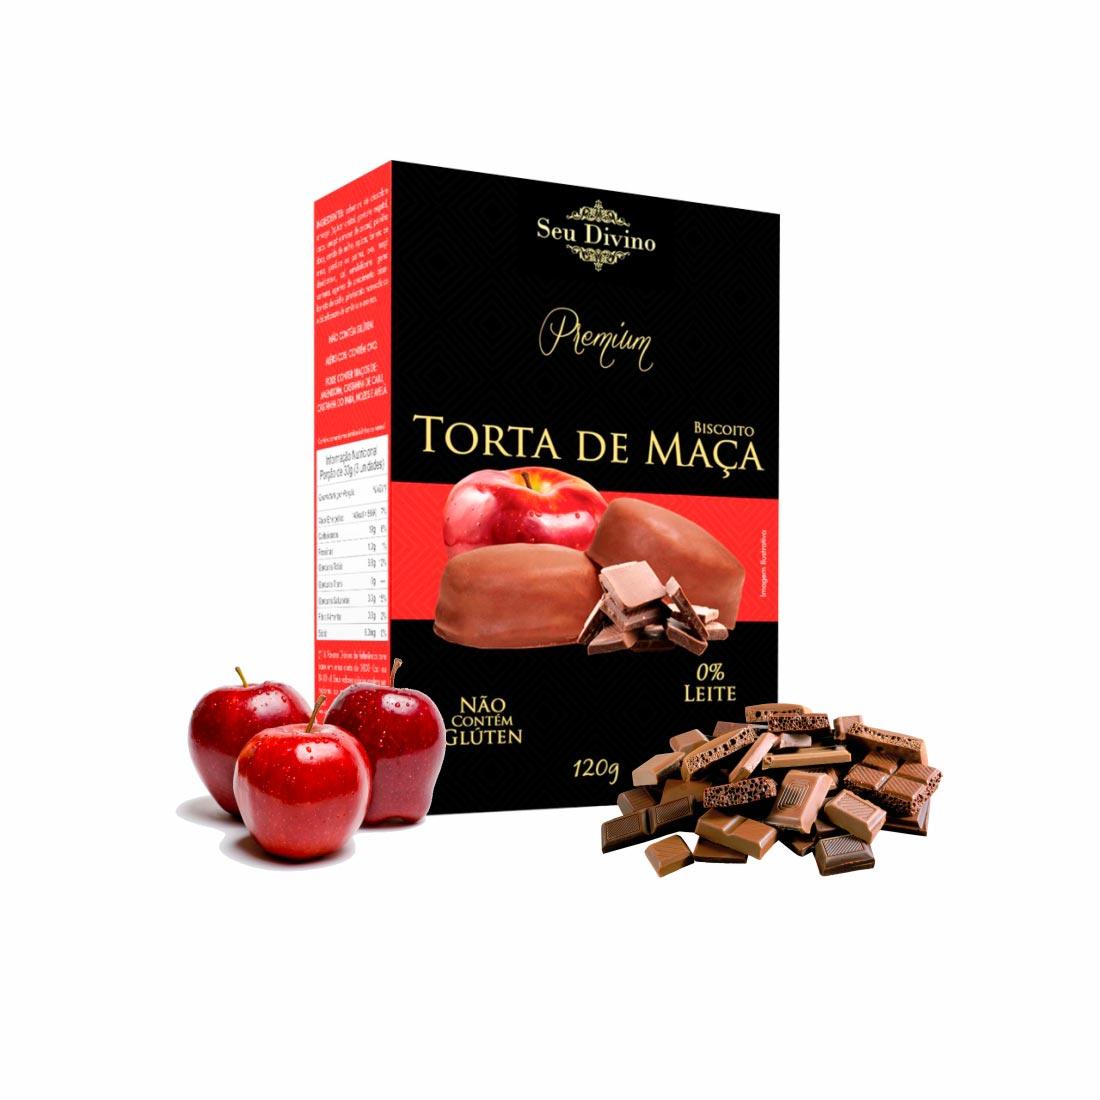 TORTA DE MAÇÃ PREMIUM SEU DIVINO S/GLÚTEN 0%LACTOSE VEGANO 120G